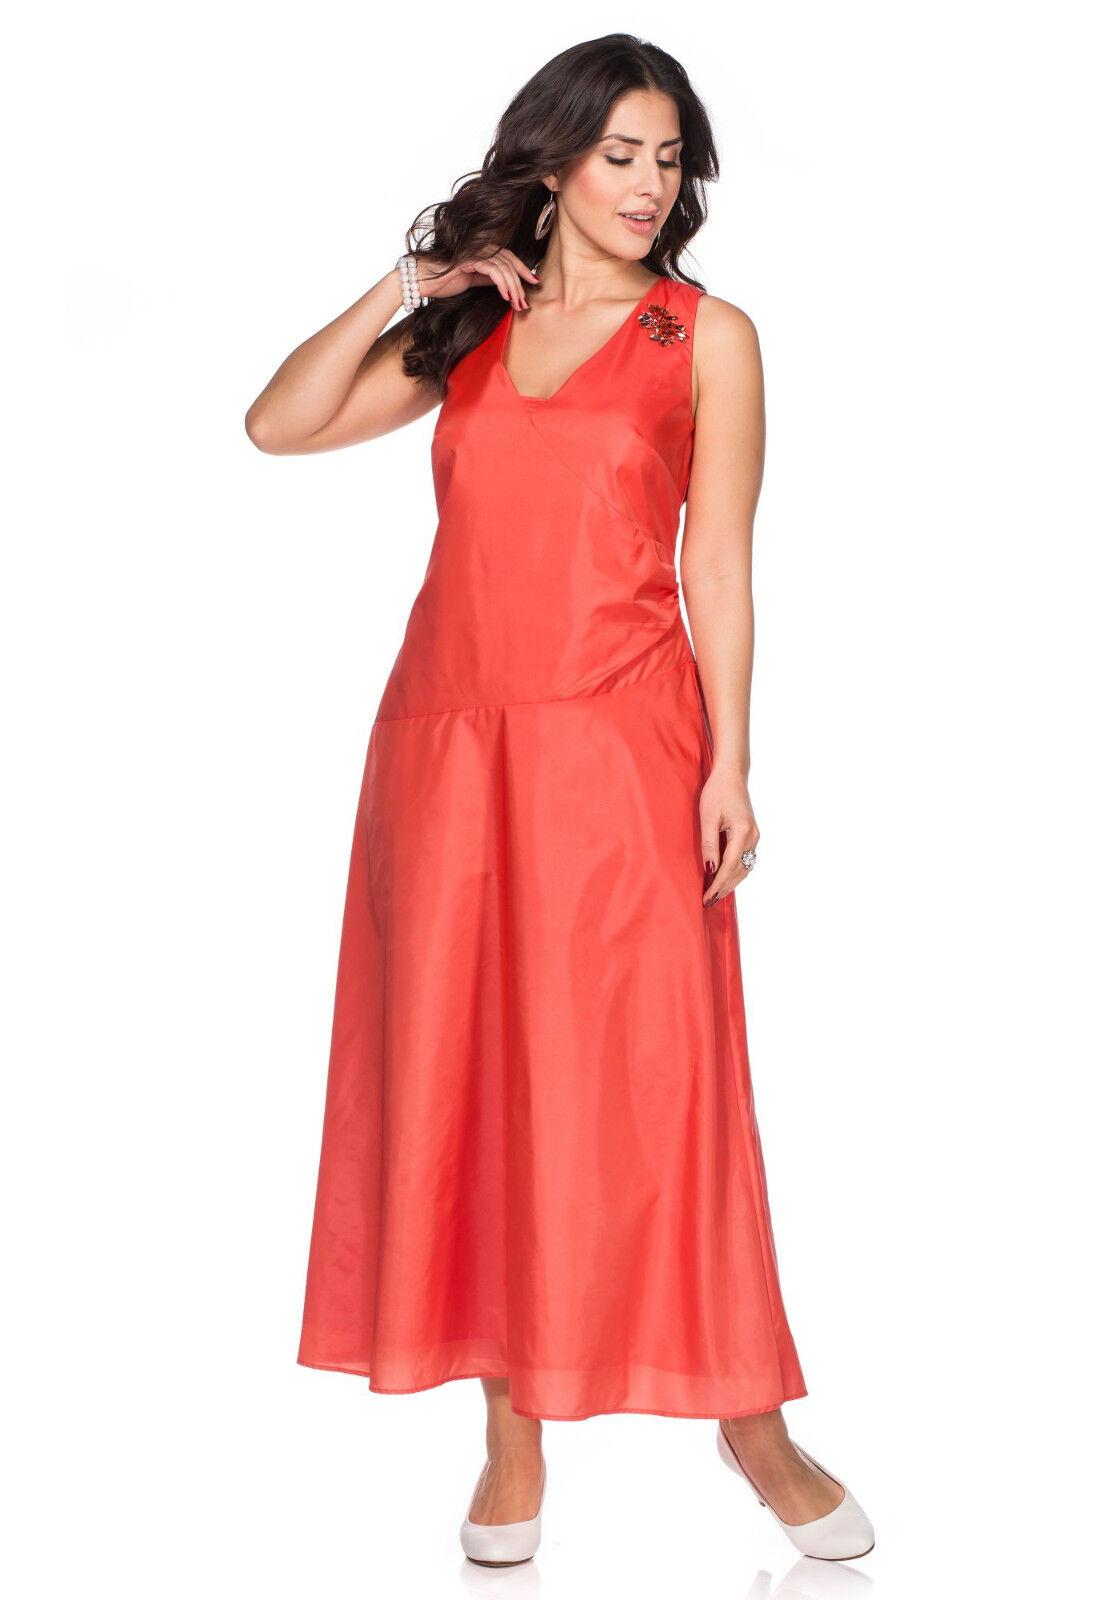 Details zu Elegantes Abend-Kleid sheego Style. Koralle. NEU!!! KP 11,11 €  SALE%%%